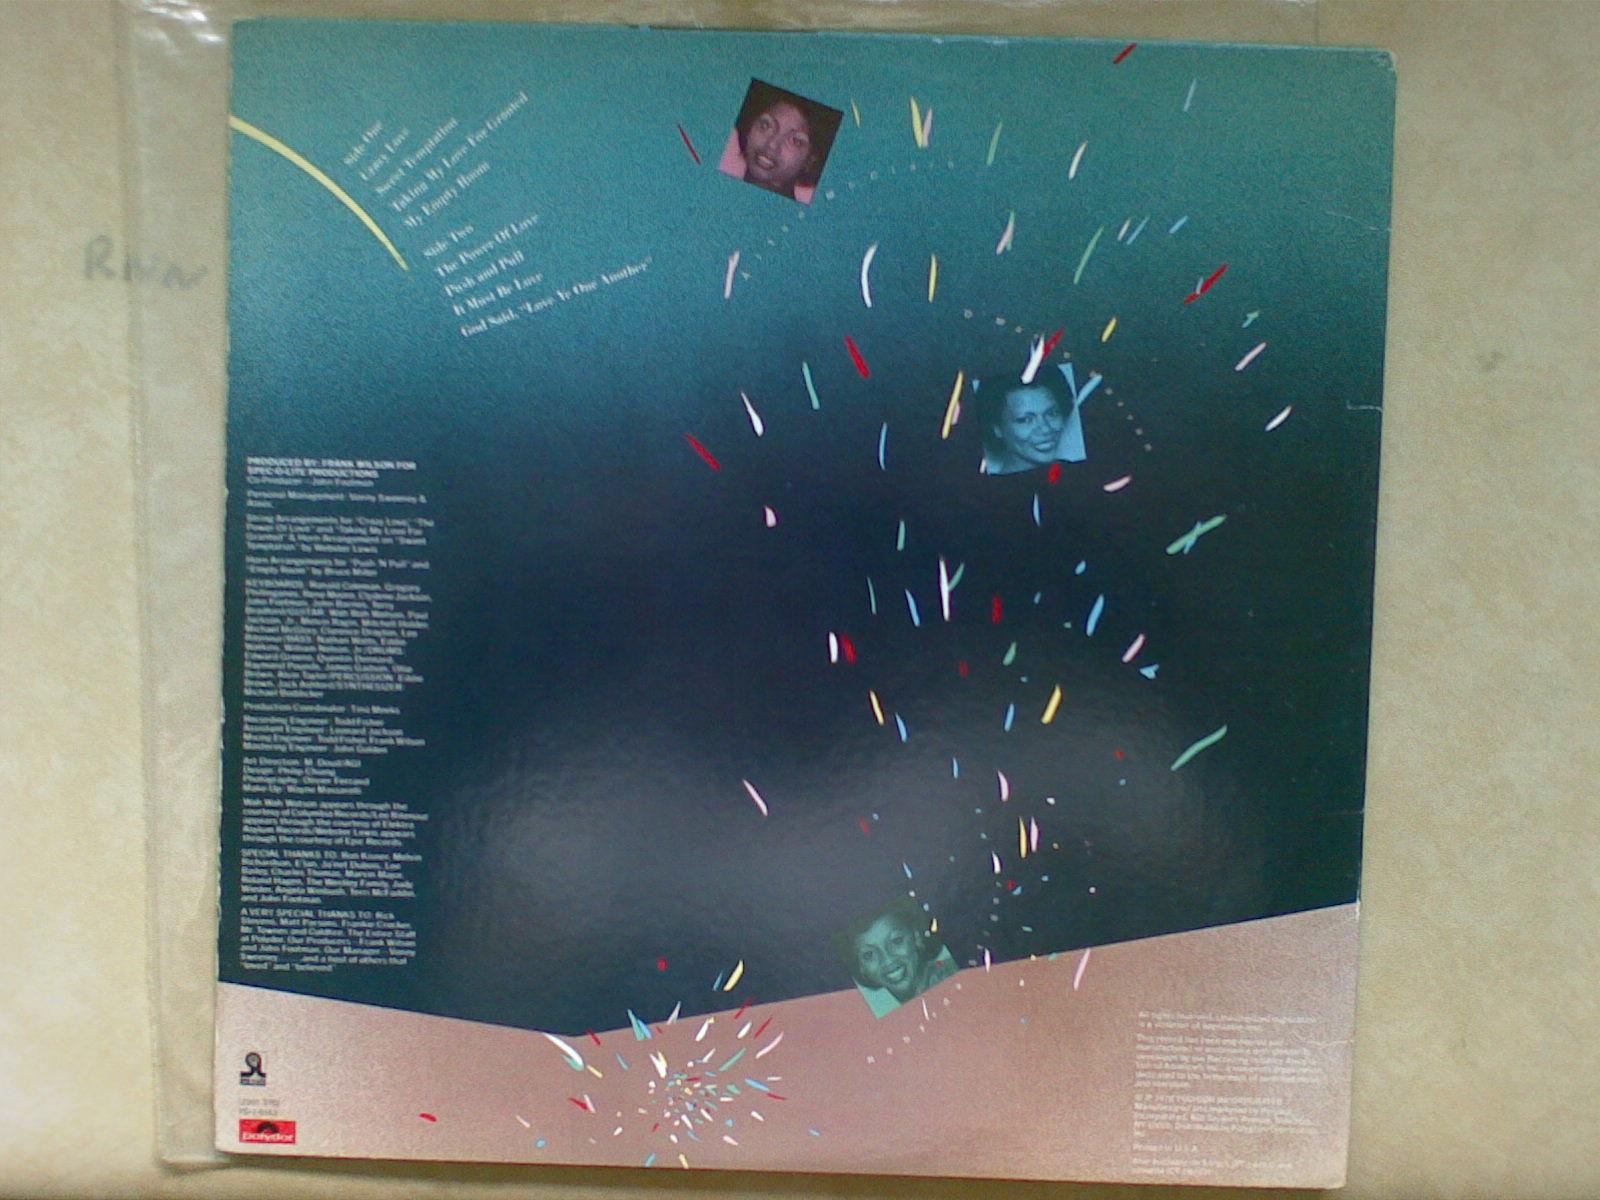 Alton Mc Clain Amp Destiny Alton Mcclain Amp Destiny 1978